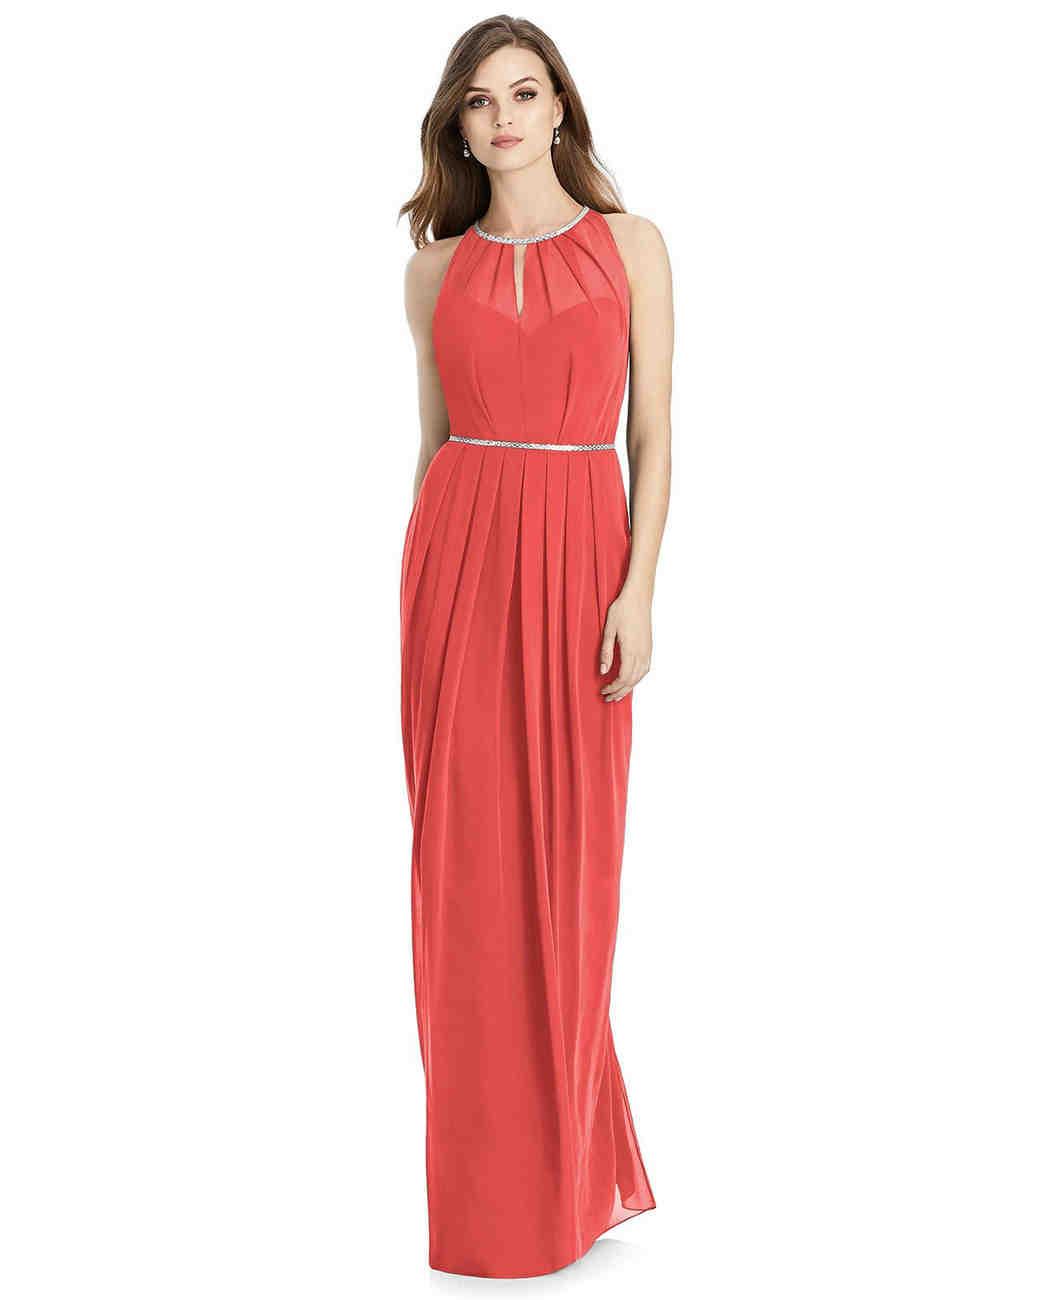 c325a5efe4f5 White By Vera Wang Long Ruched Bridesmaid Dress With Ruffles ...